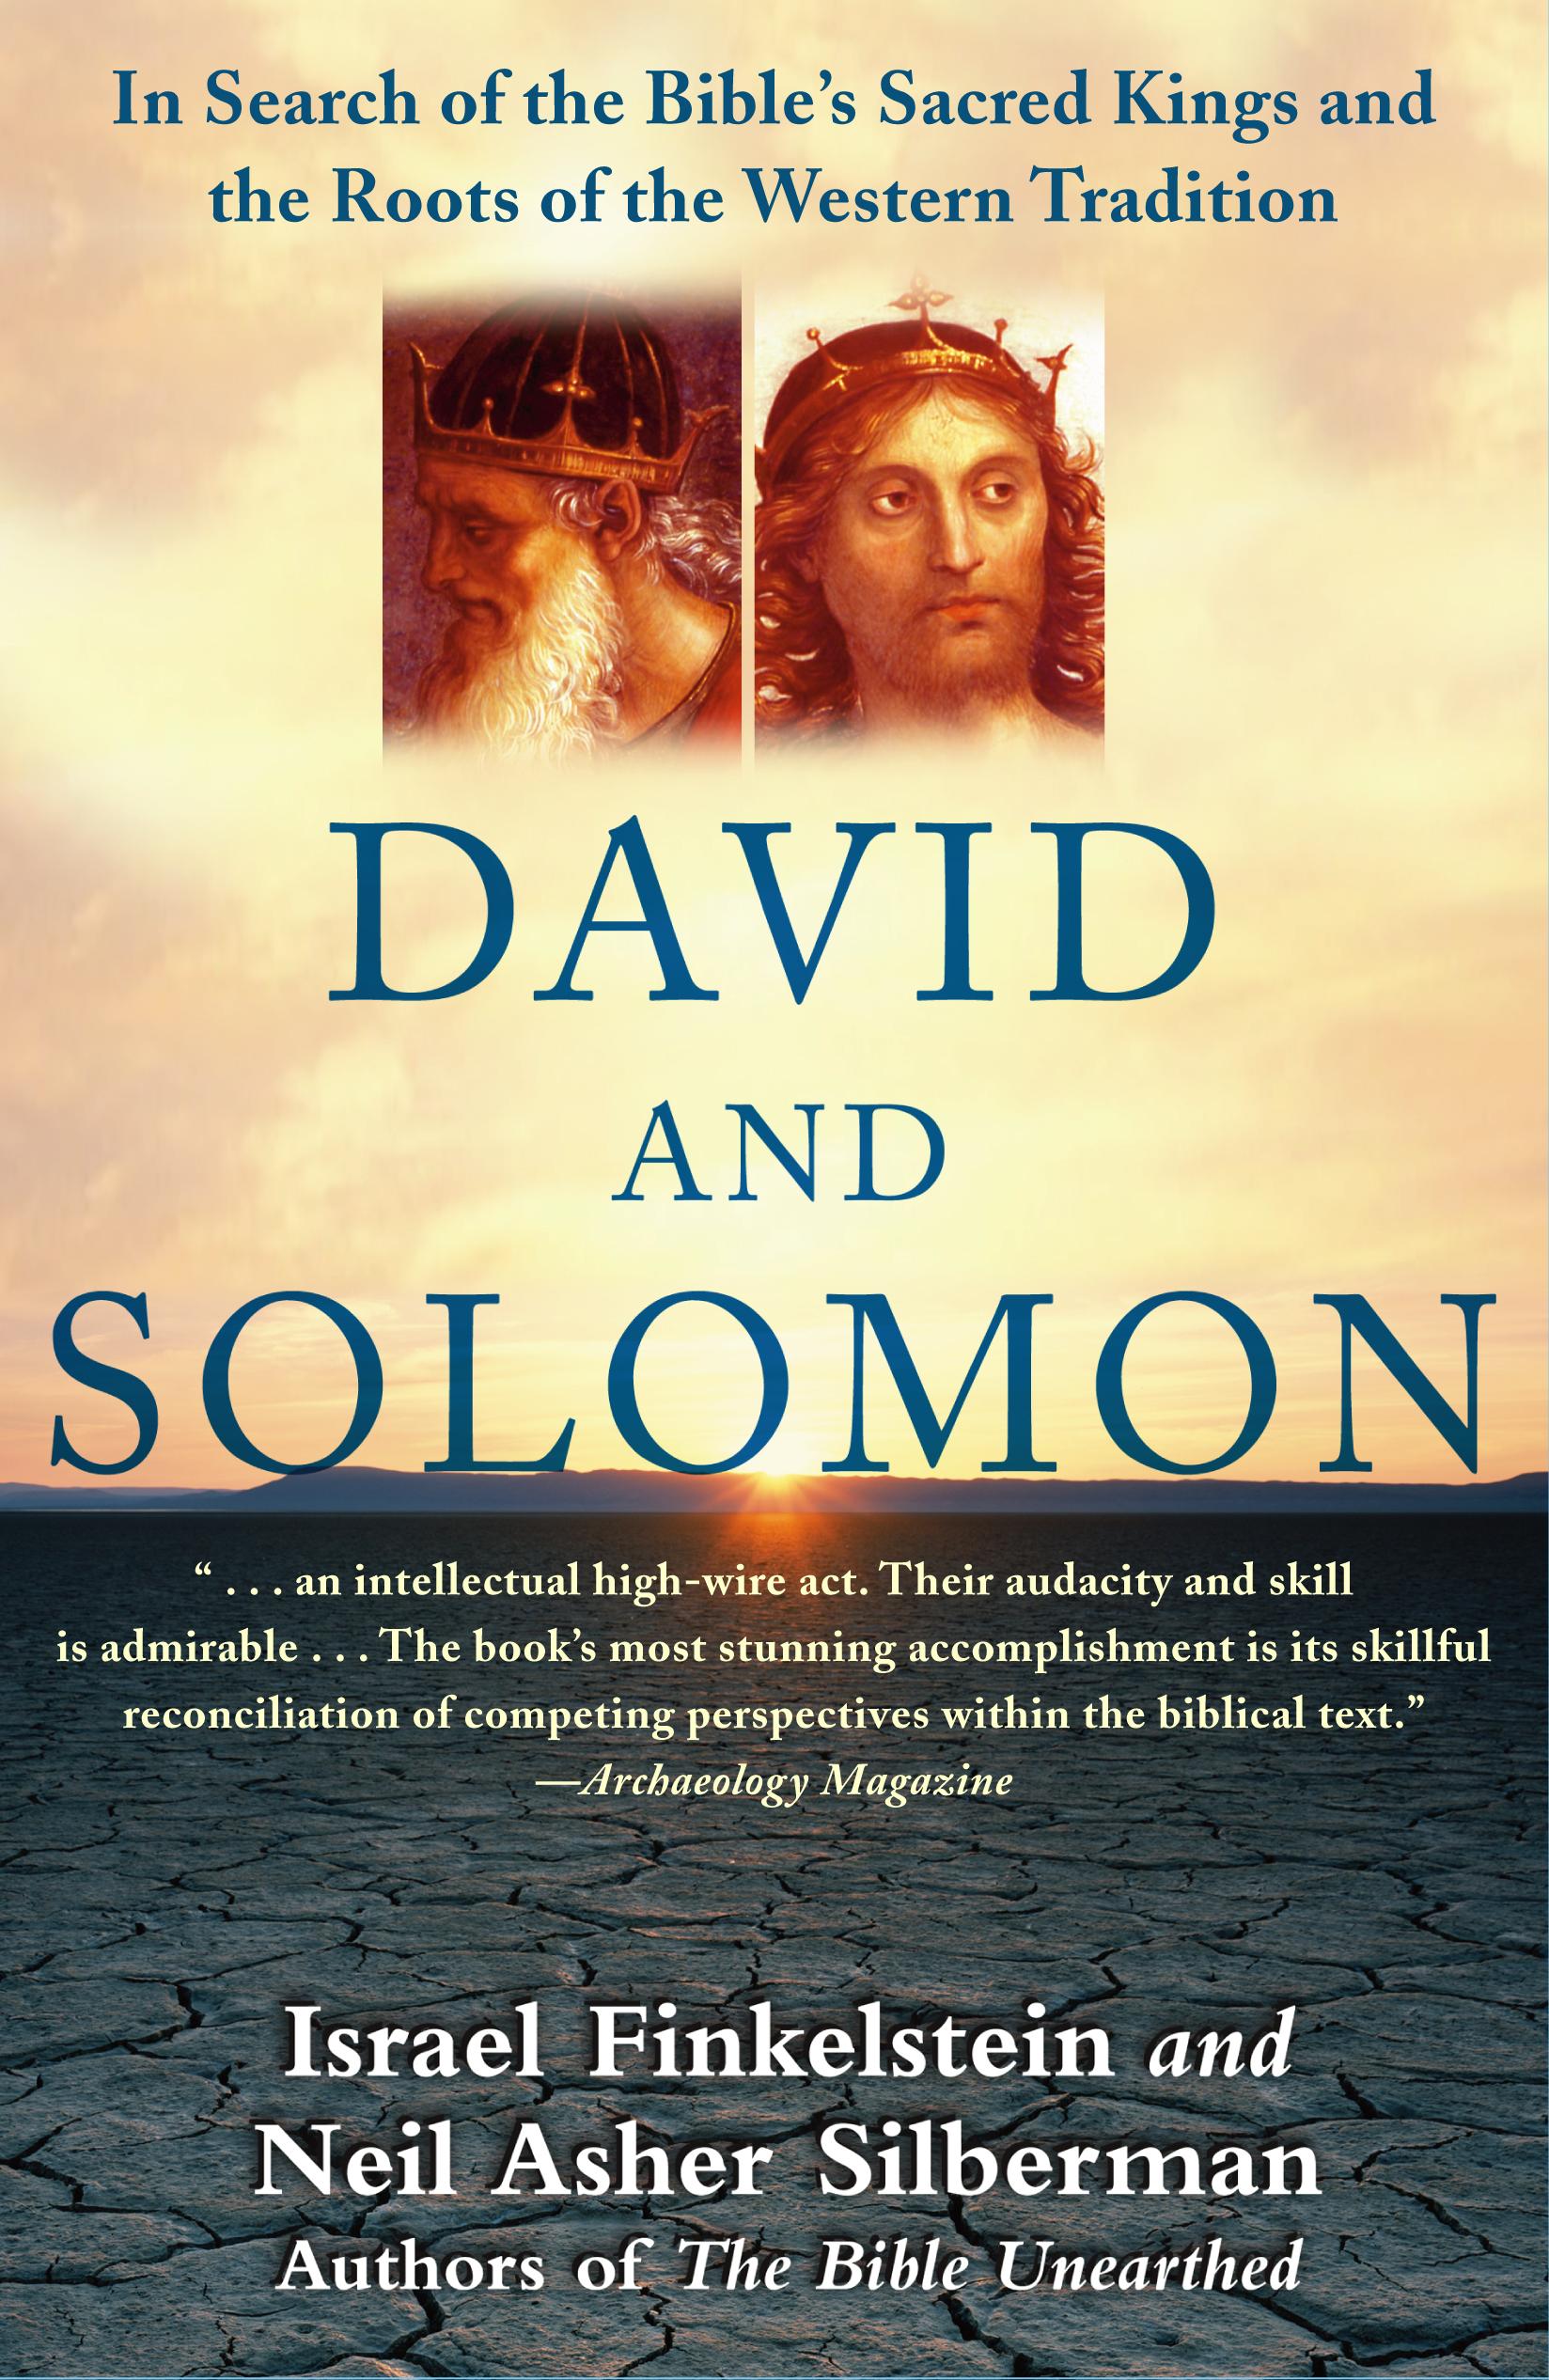 David and Solomon Finkelstein Silberman.jpg